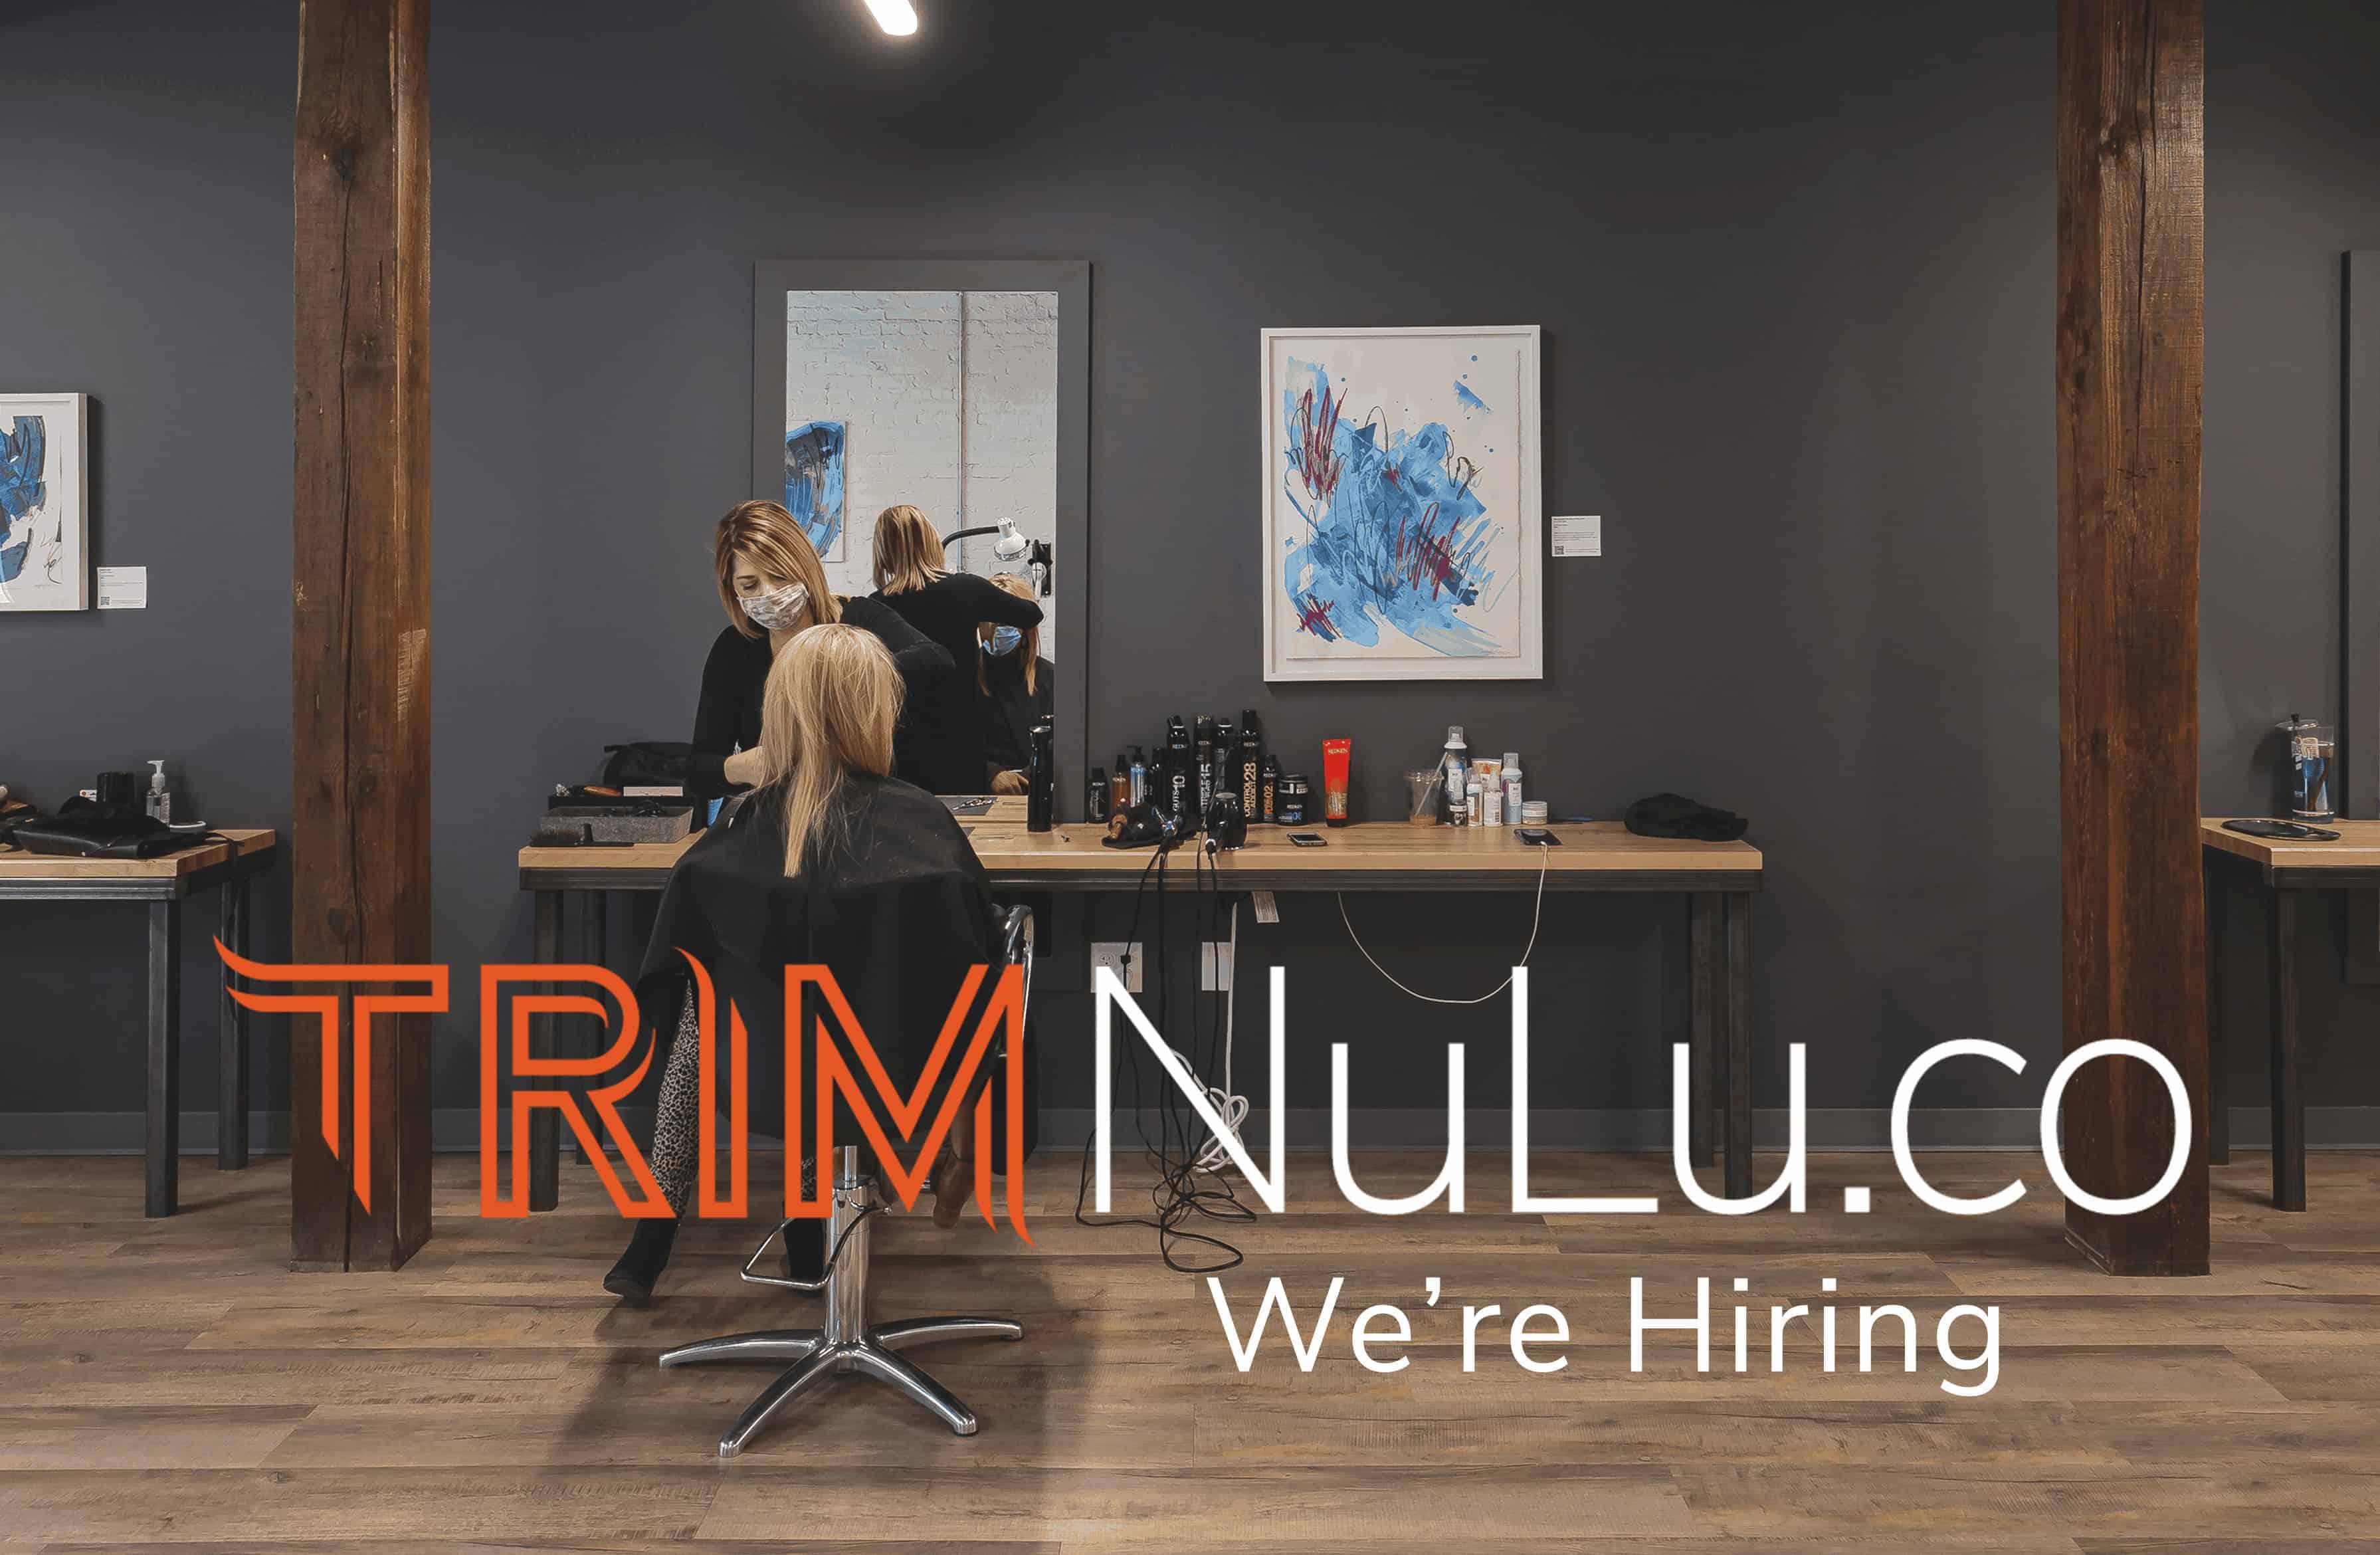 The best hair salon in louisville is hiring